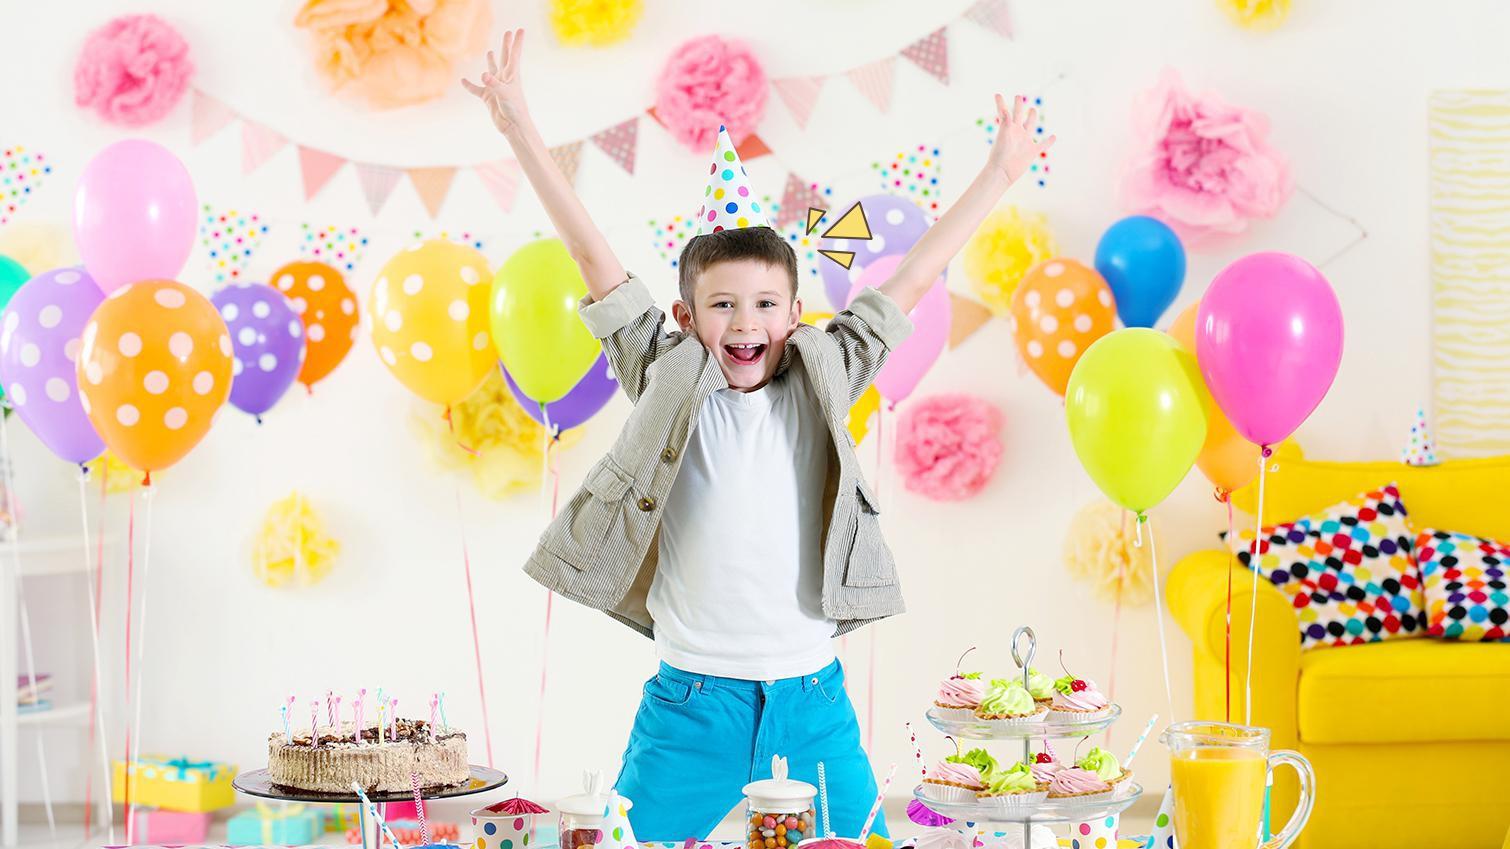 5 Ide Tema Pesta Ulang Tahun Anak Laki Laki